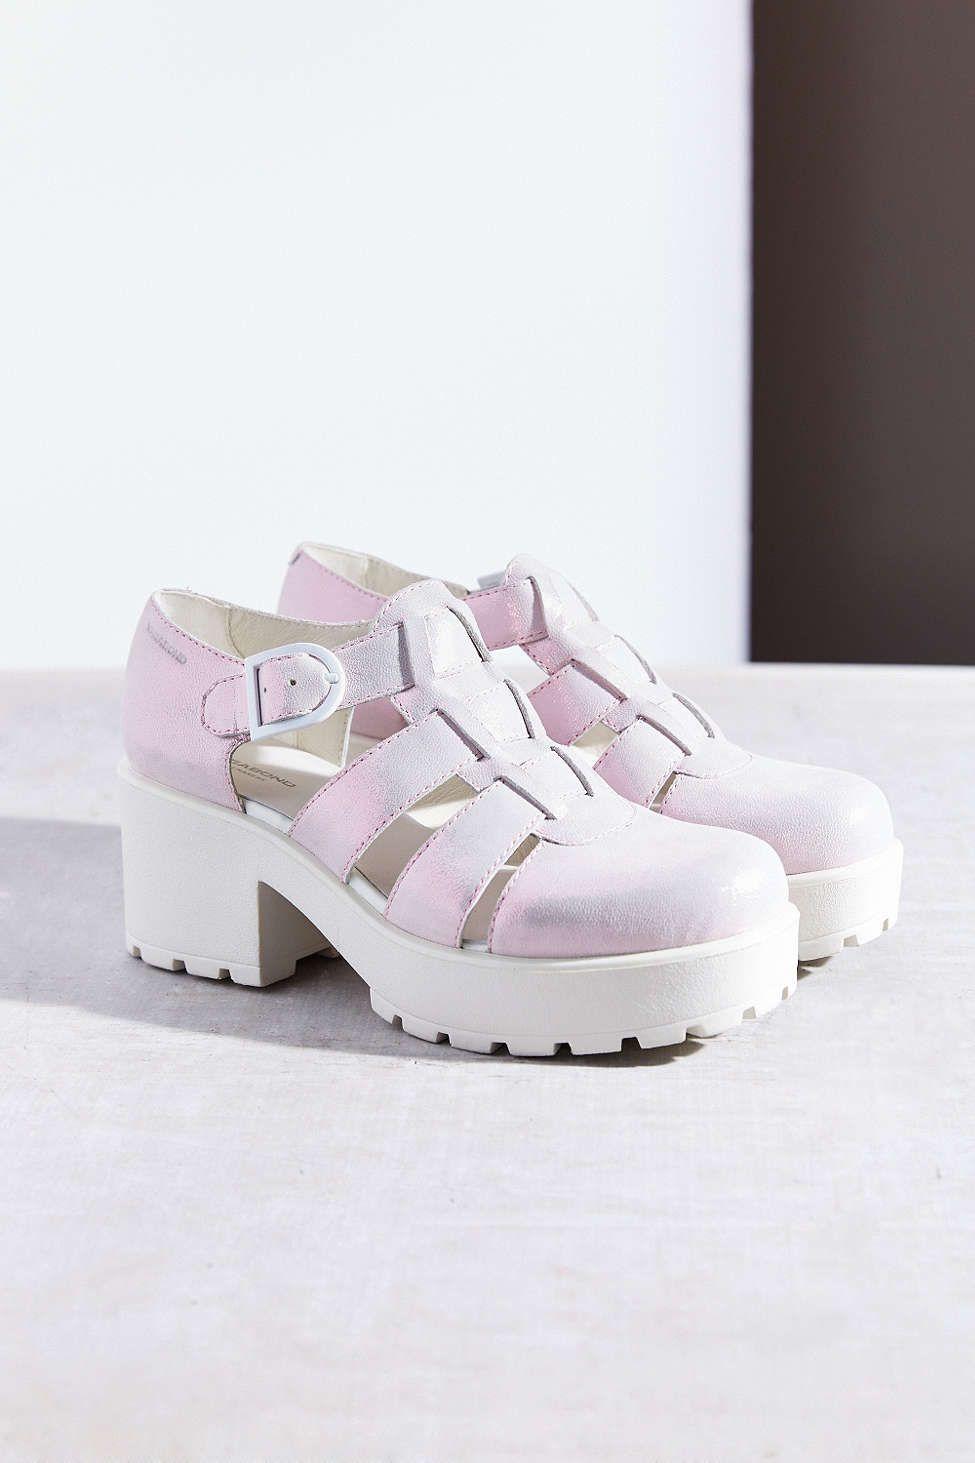 c5ee59c60be Vagabond Dioon Fisherman Platform Sandal - Urban Outfitters | Shoes ...